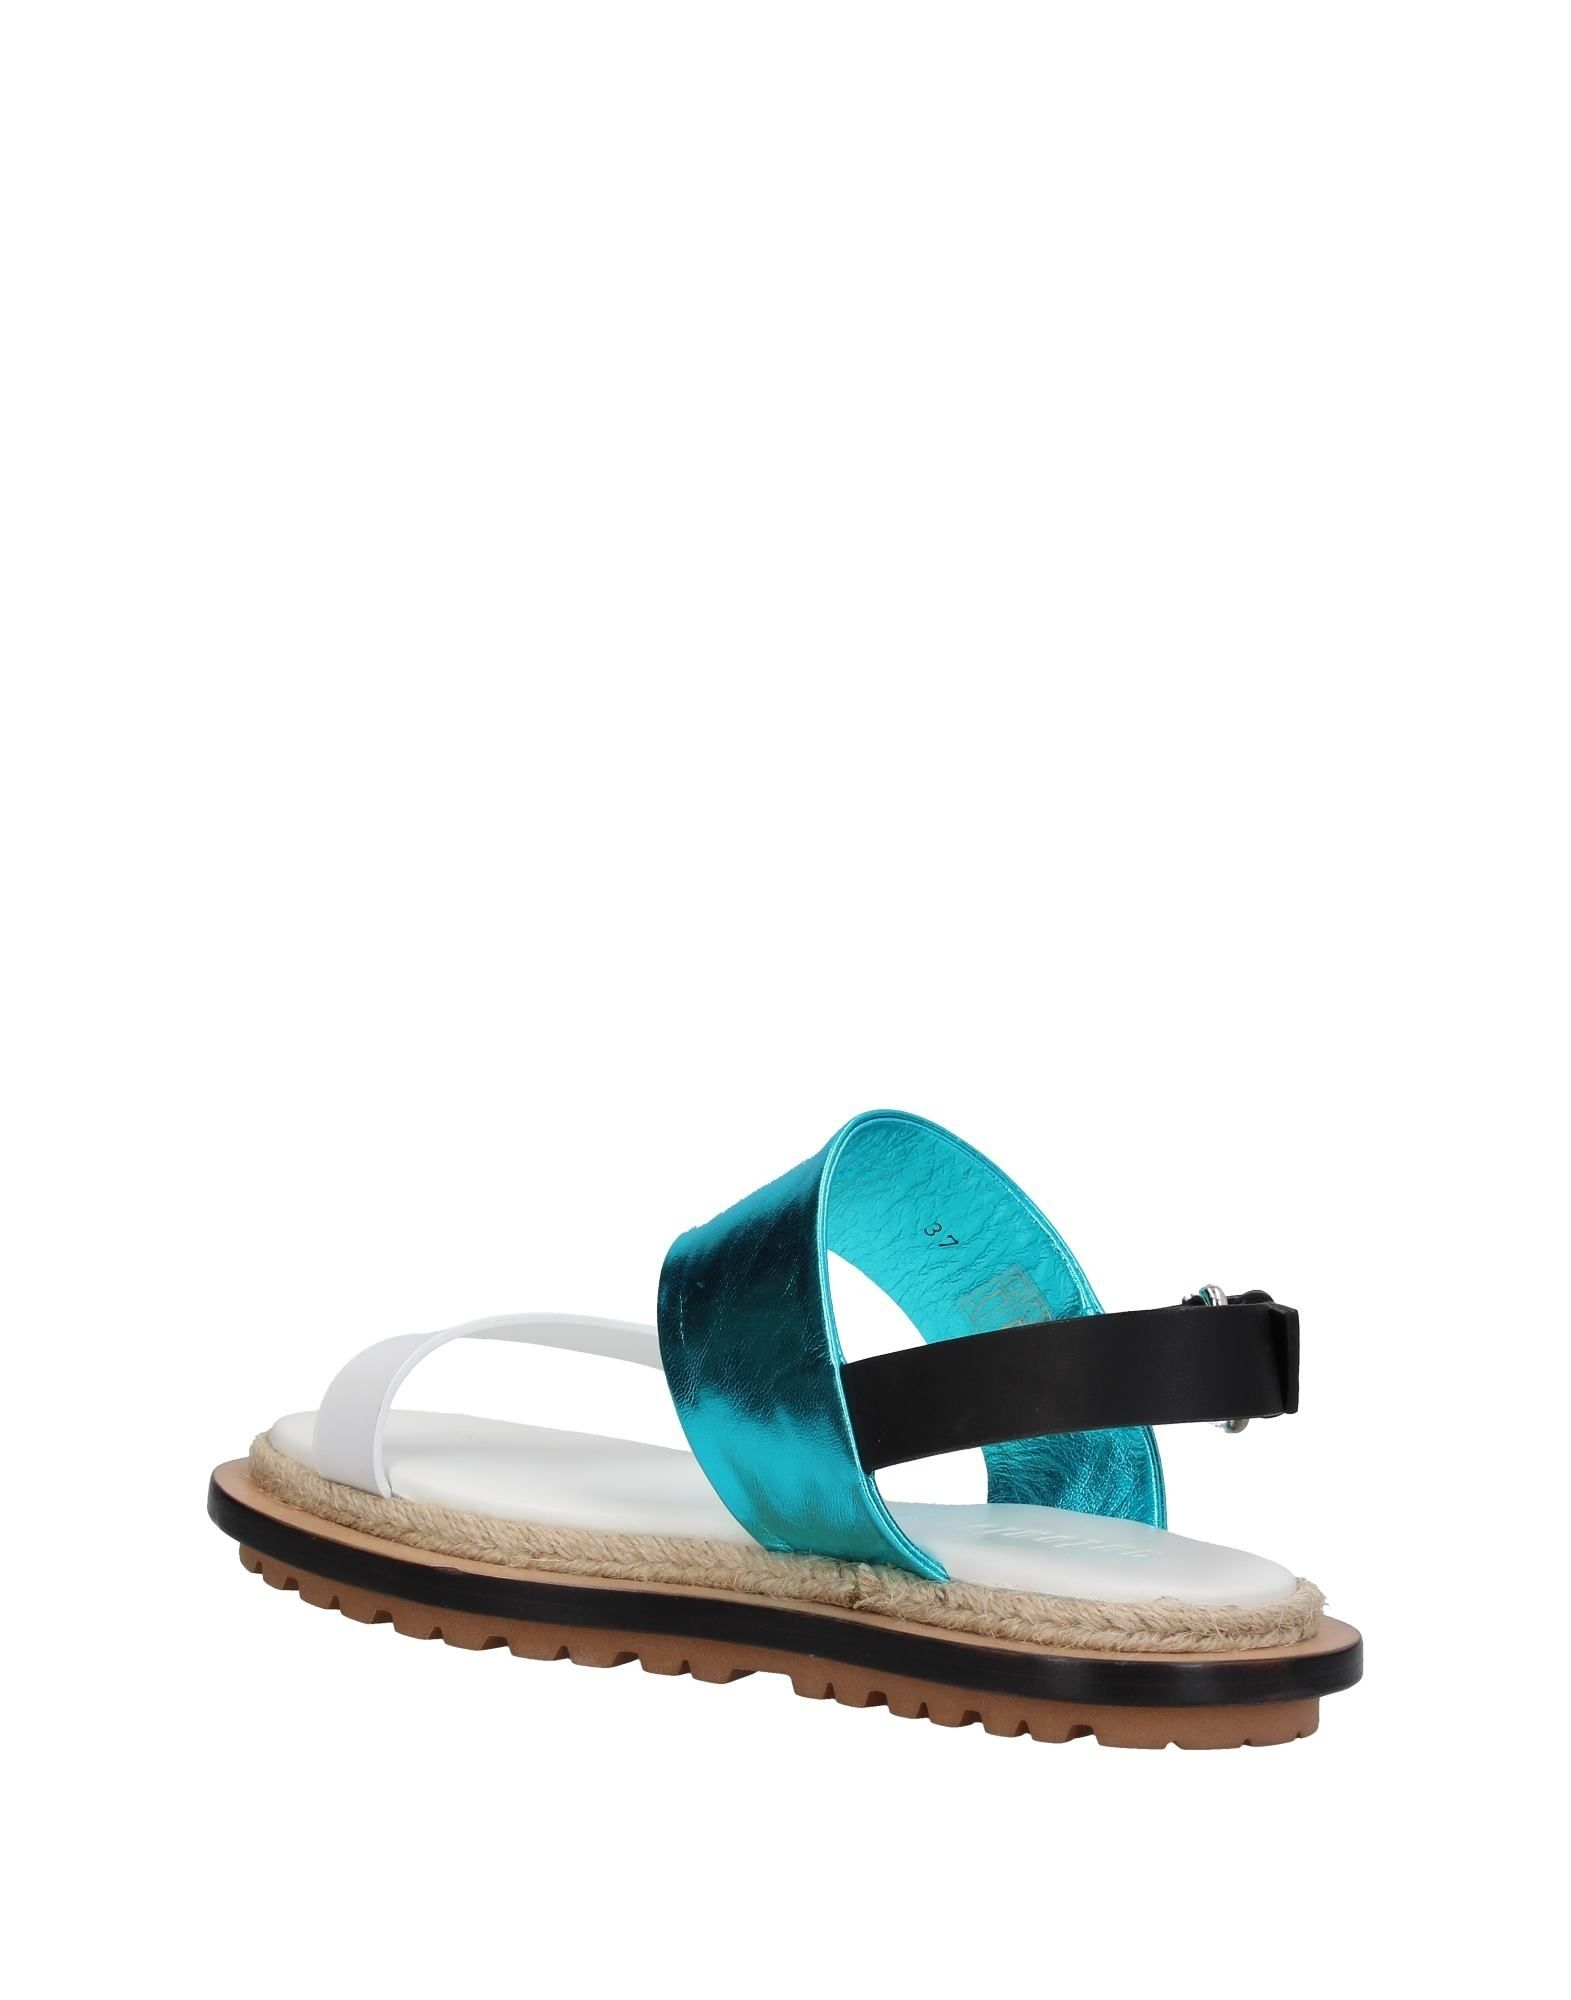 Stilvolle Sandalen billige Schuhe Antonio Marras Sandalen Stilvolle Damen  11366432NG e33094